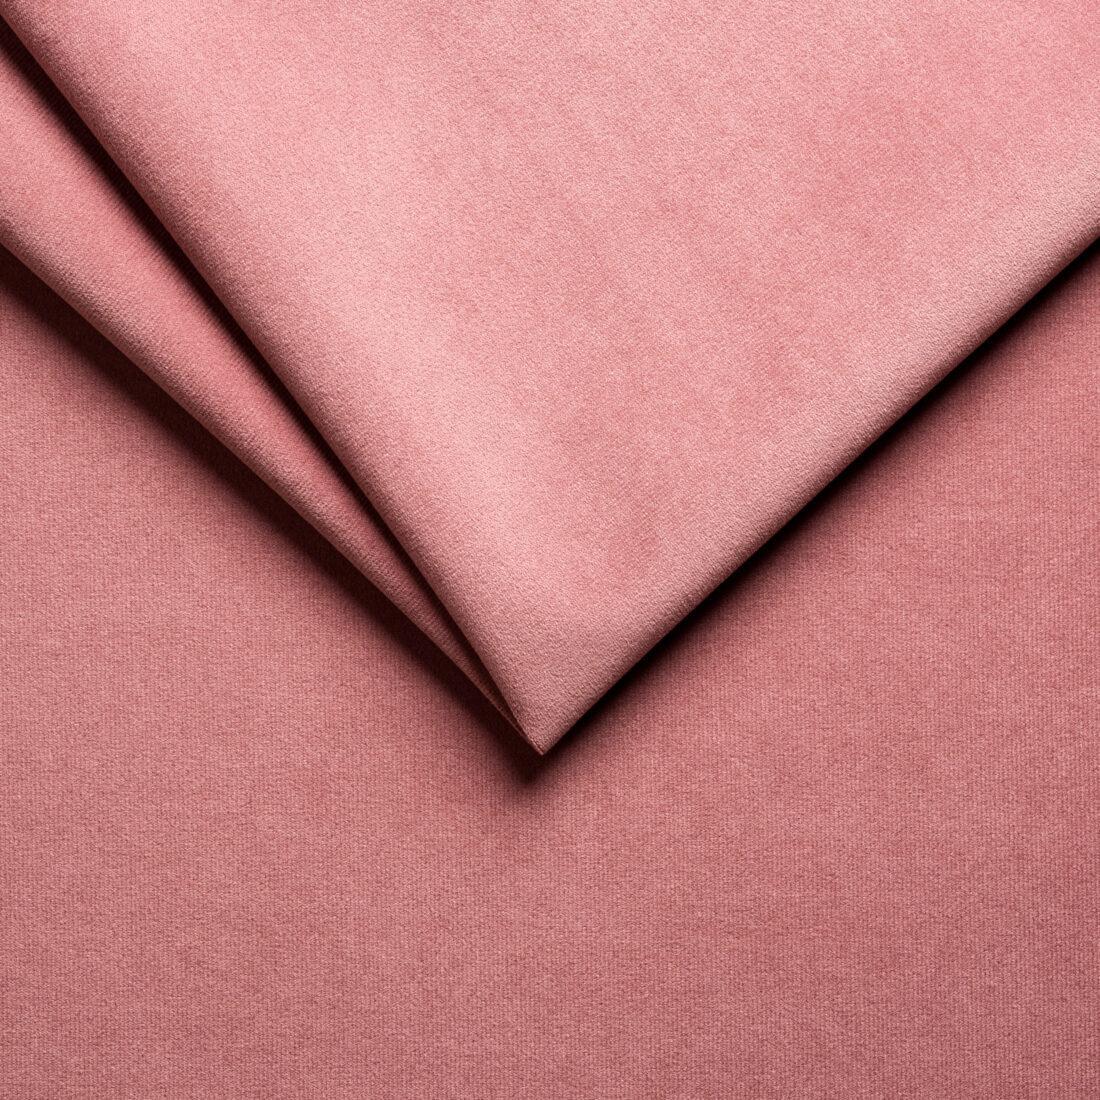 Меблева тканина Laura 23 Misty Rose, велюр